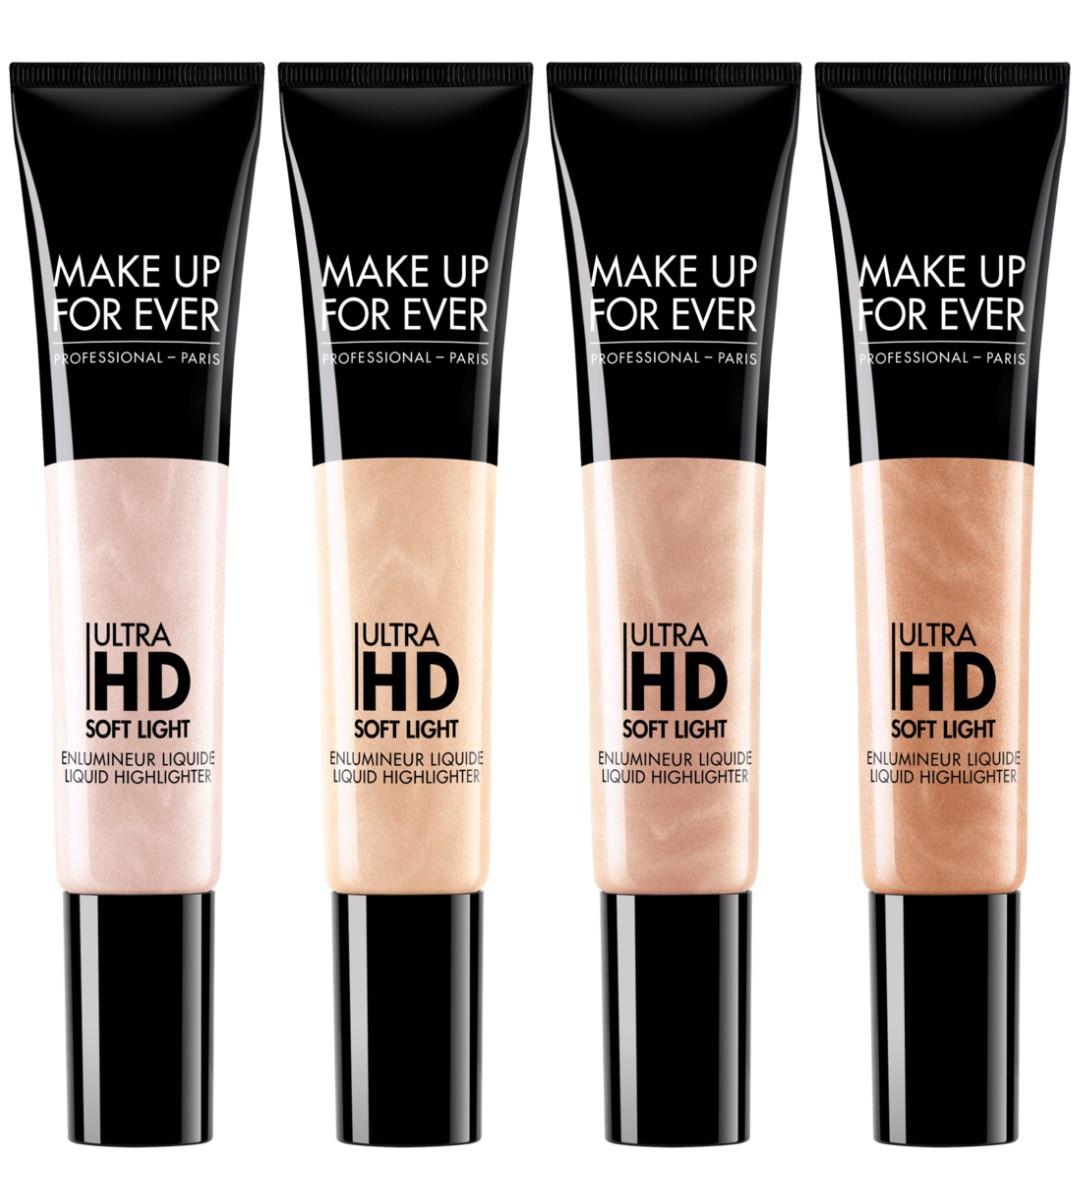 Make Up For Ever Ultra Hd Soft Light